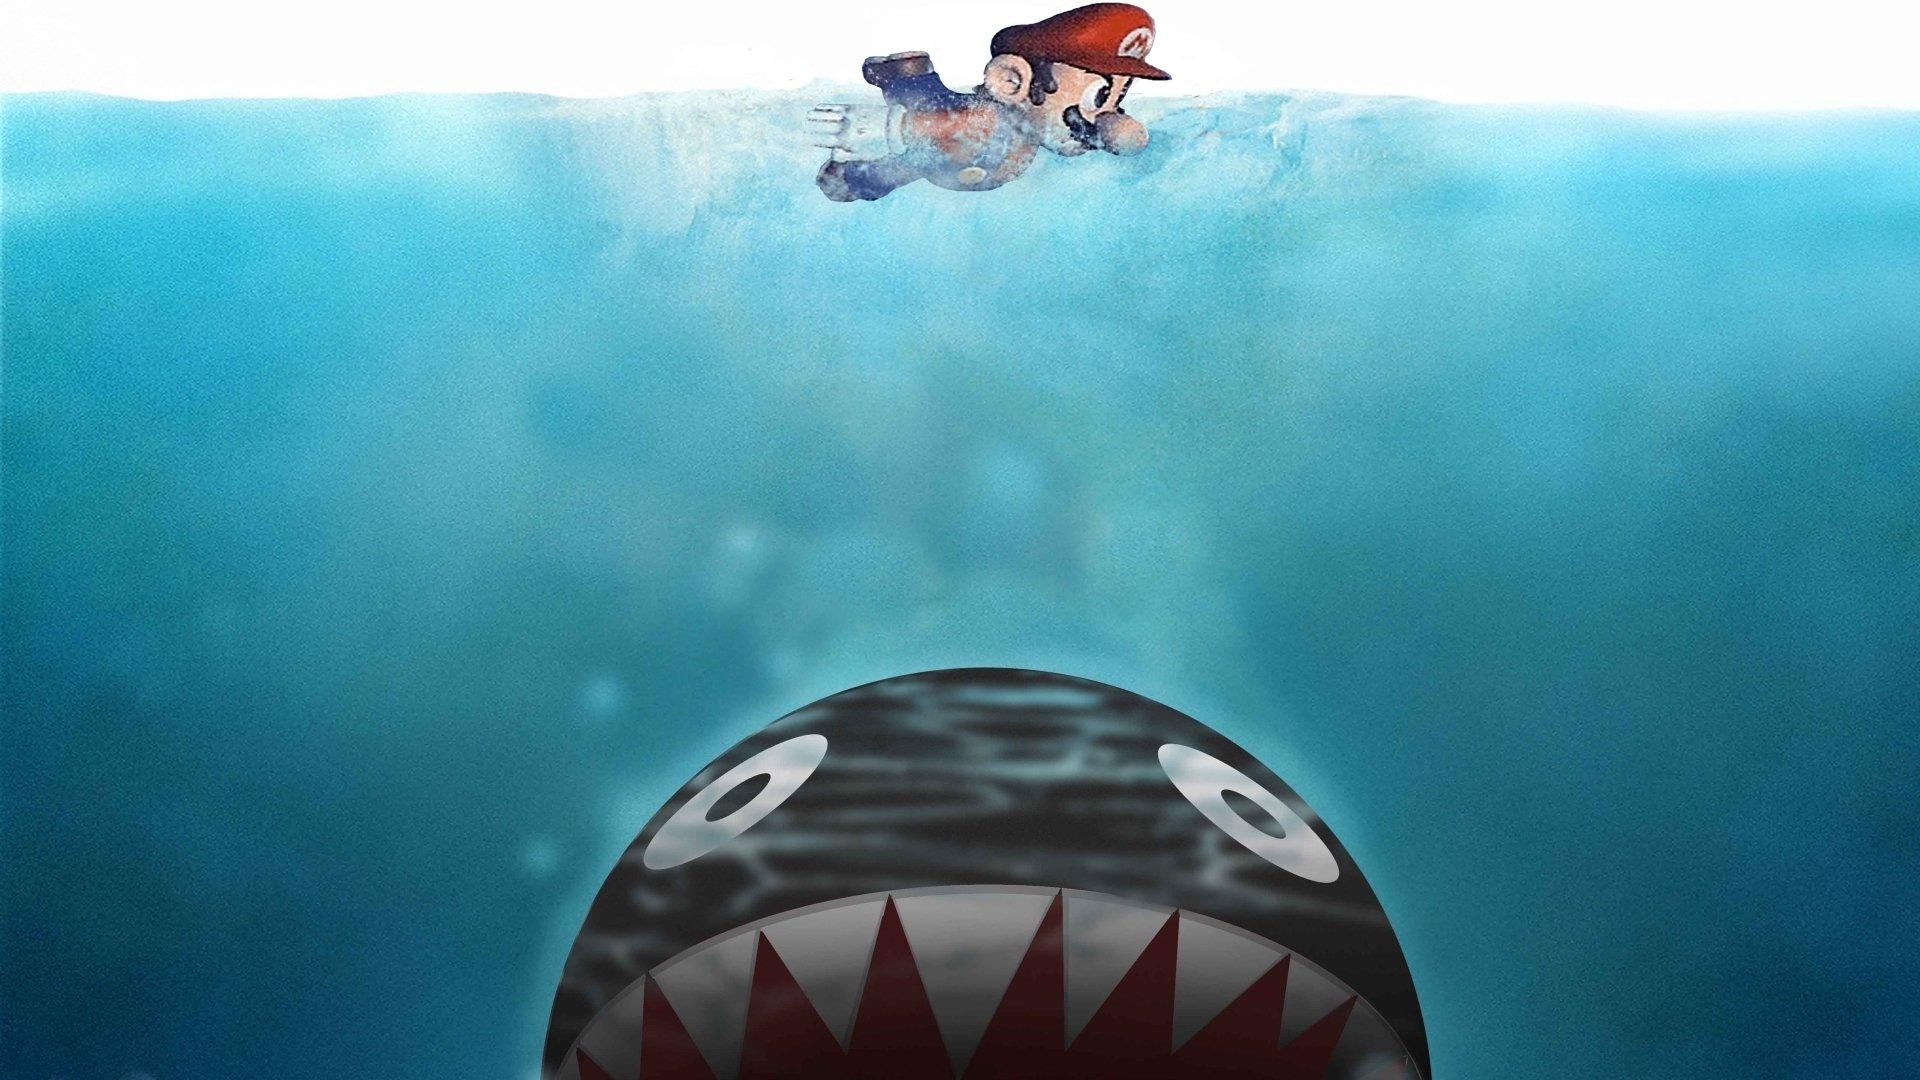 Videojuego - Super Mario World  Chain Chomp Fondo de Pantalla